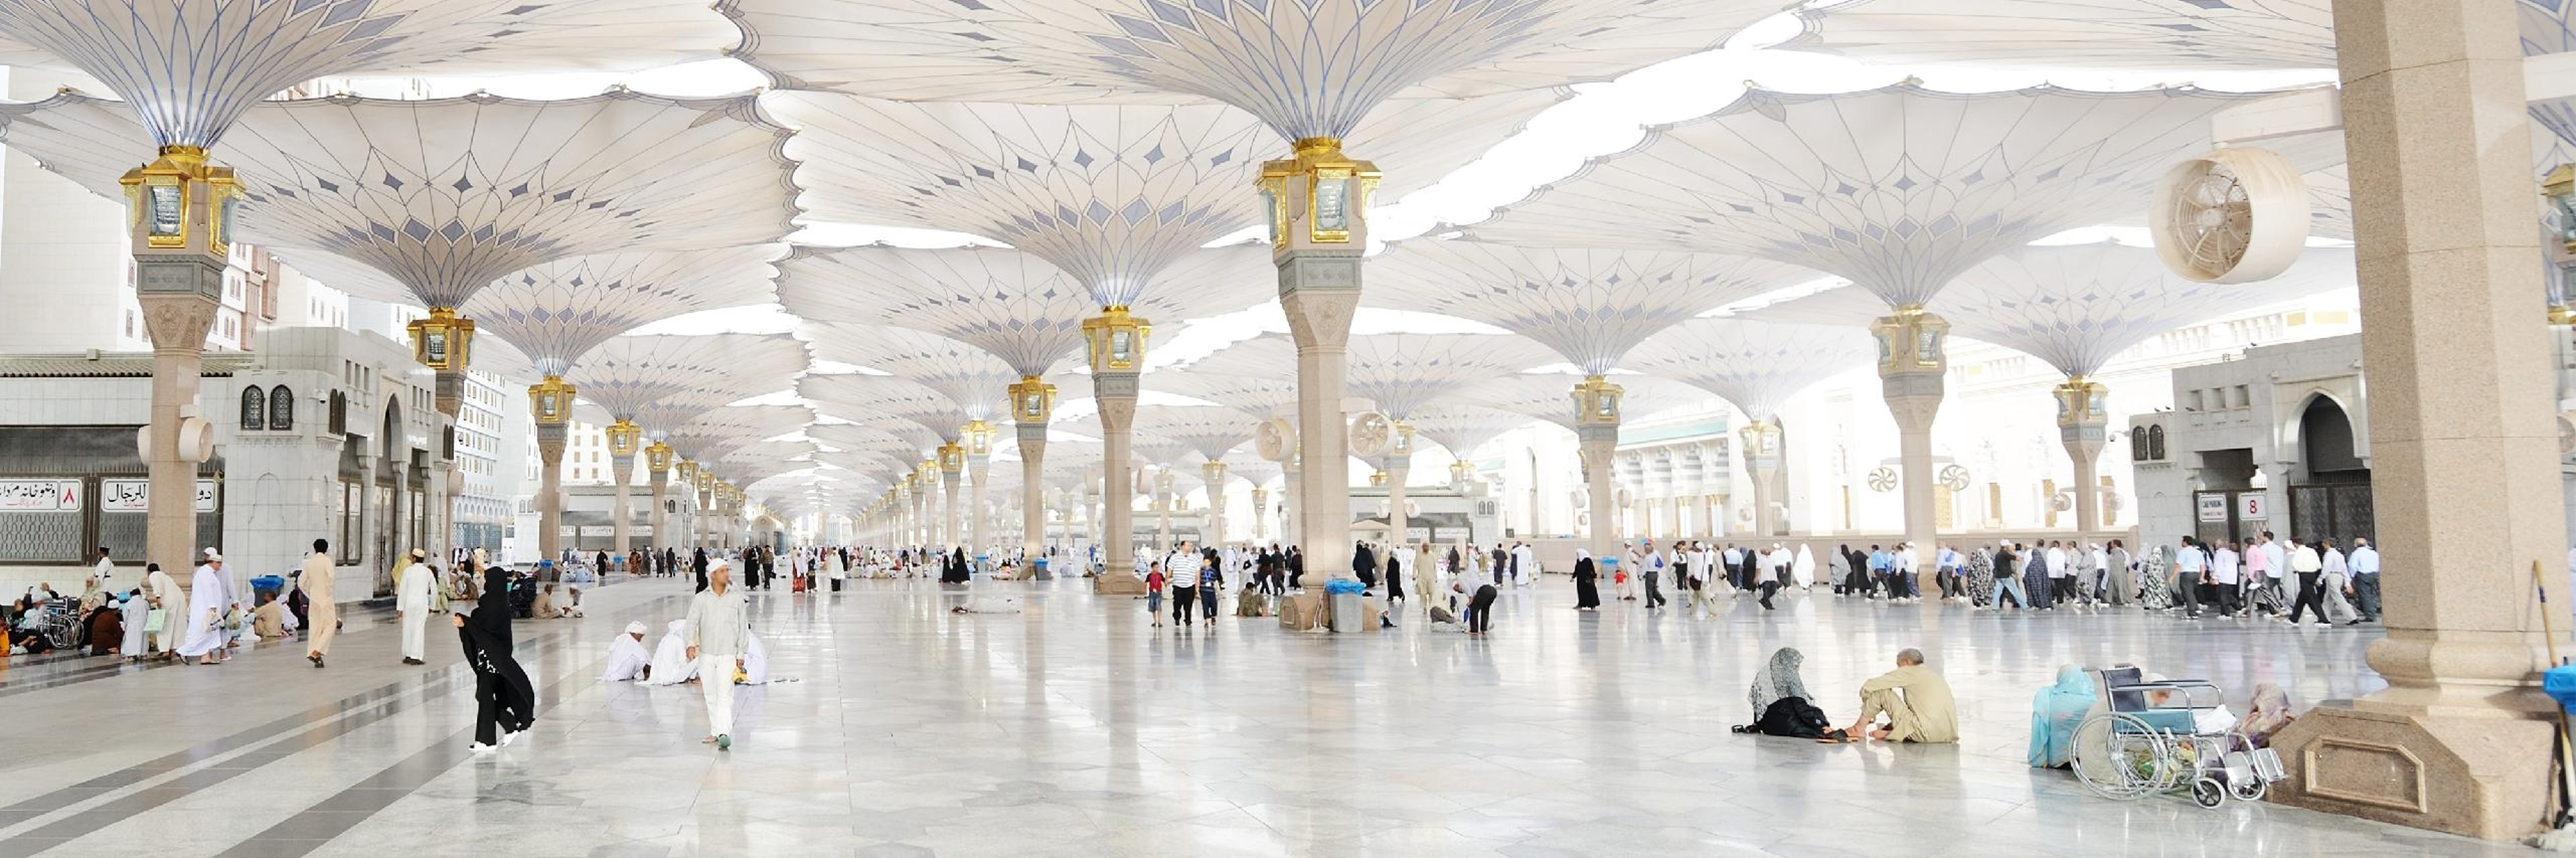 The Accomplishments of Prophet Muhammad ﷺ: The Proofs Of Prophethood Series